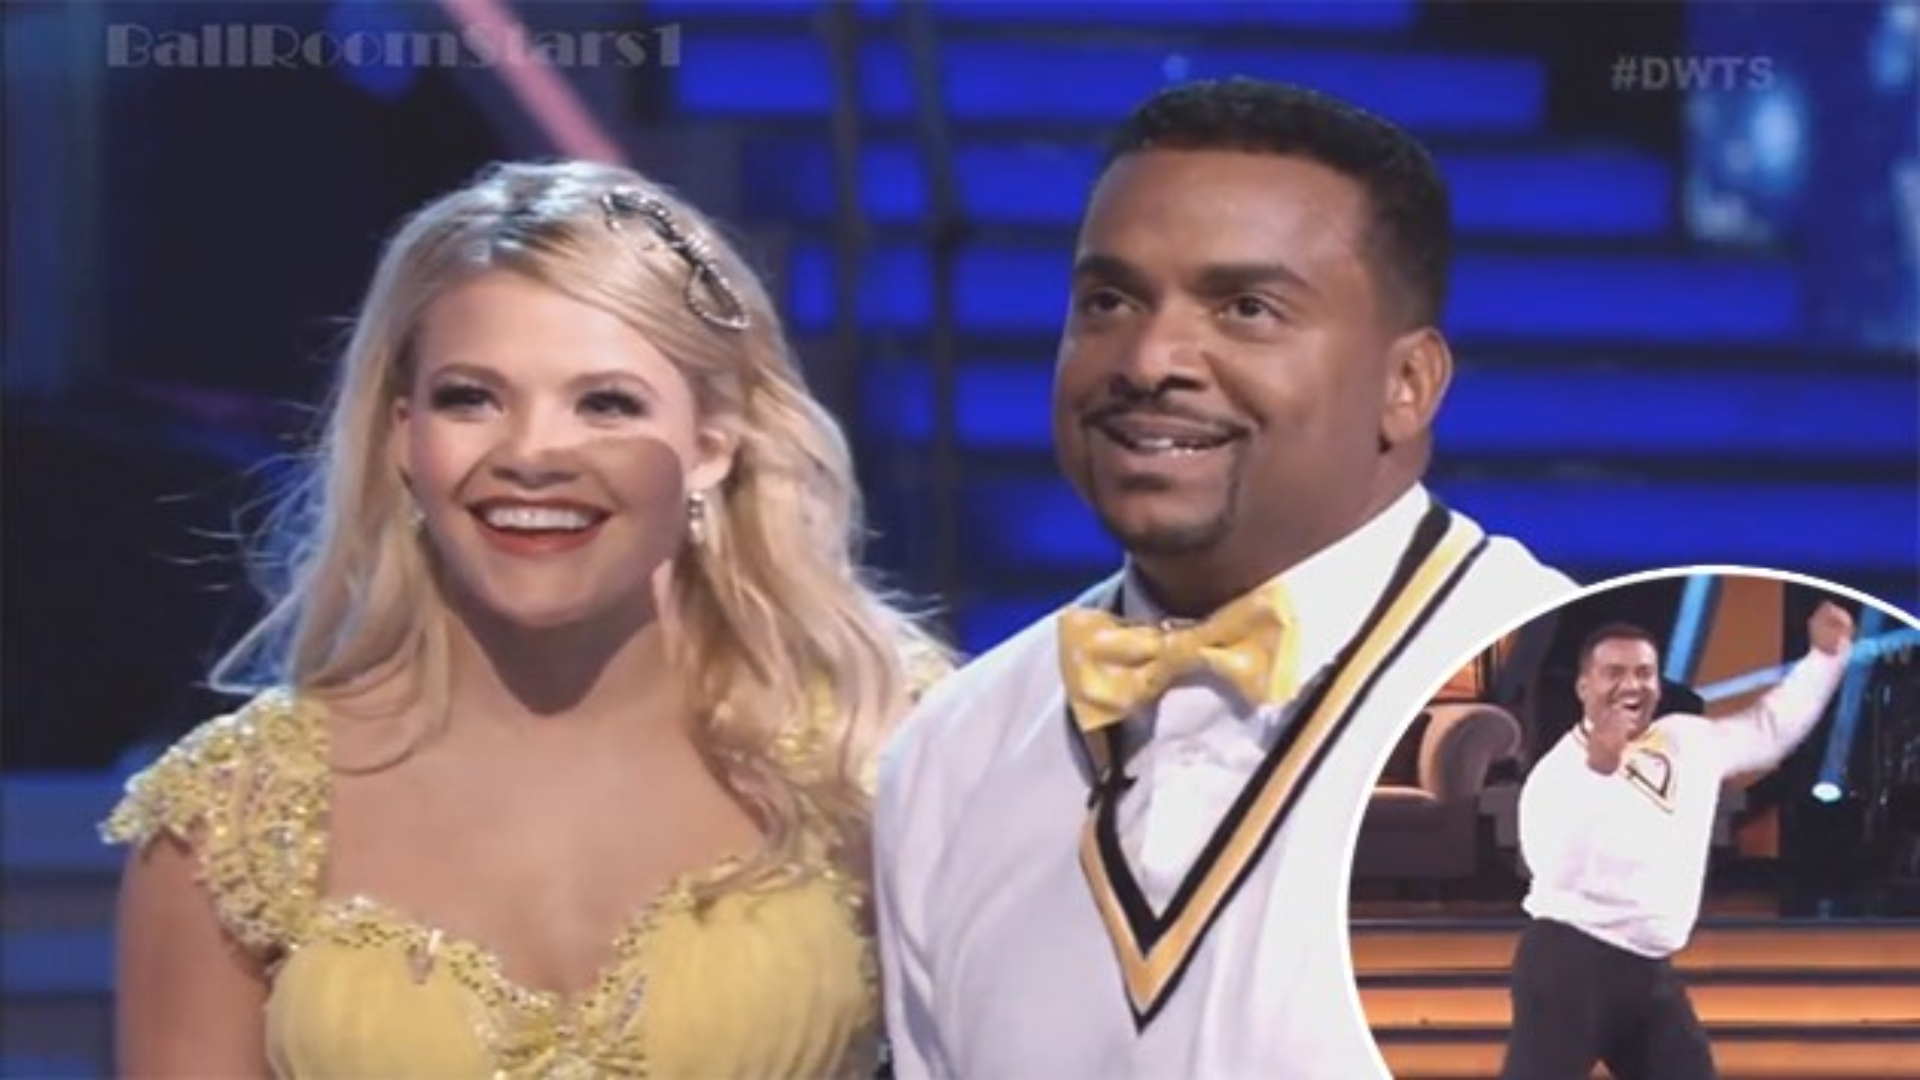 Alfonso-Ribeiro-Carlton-Dancing-with-the-Stars